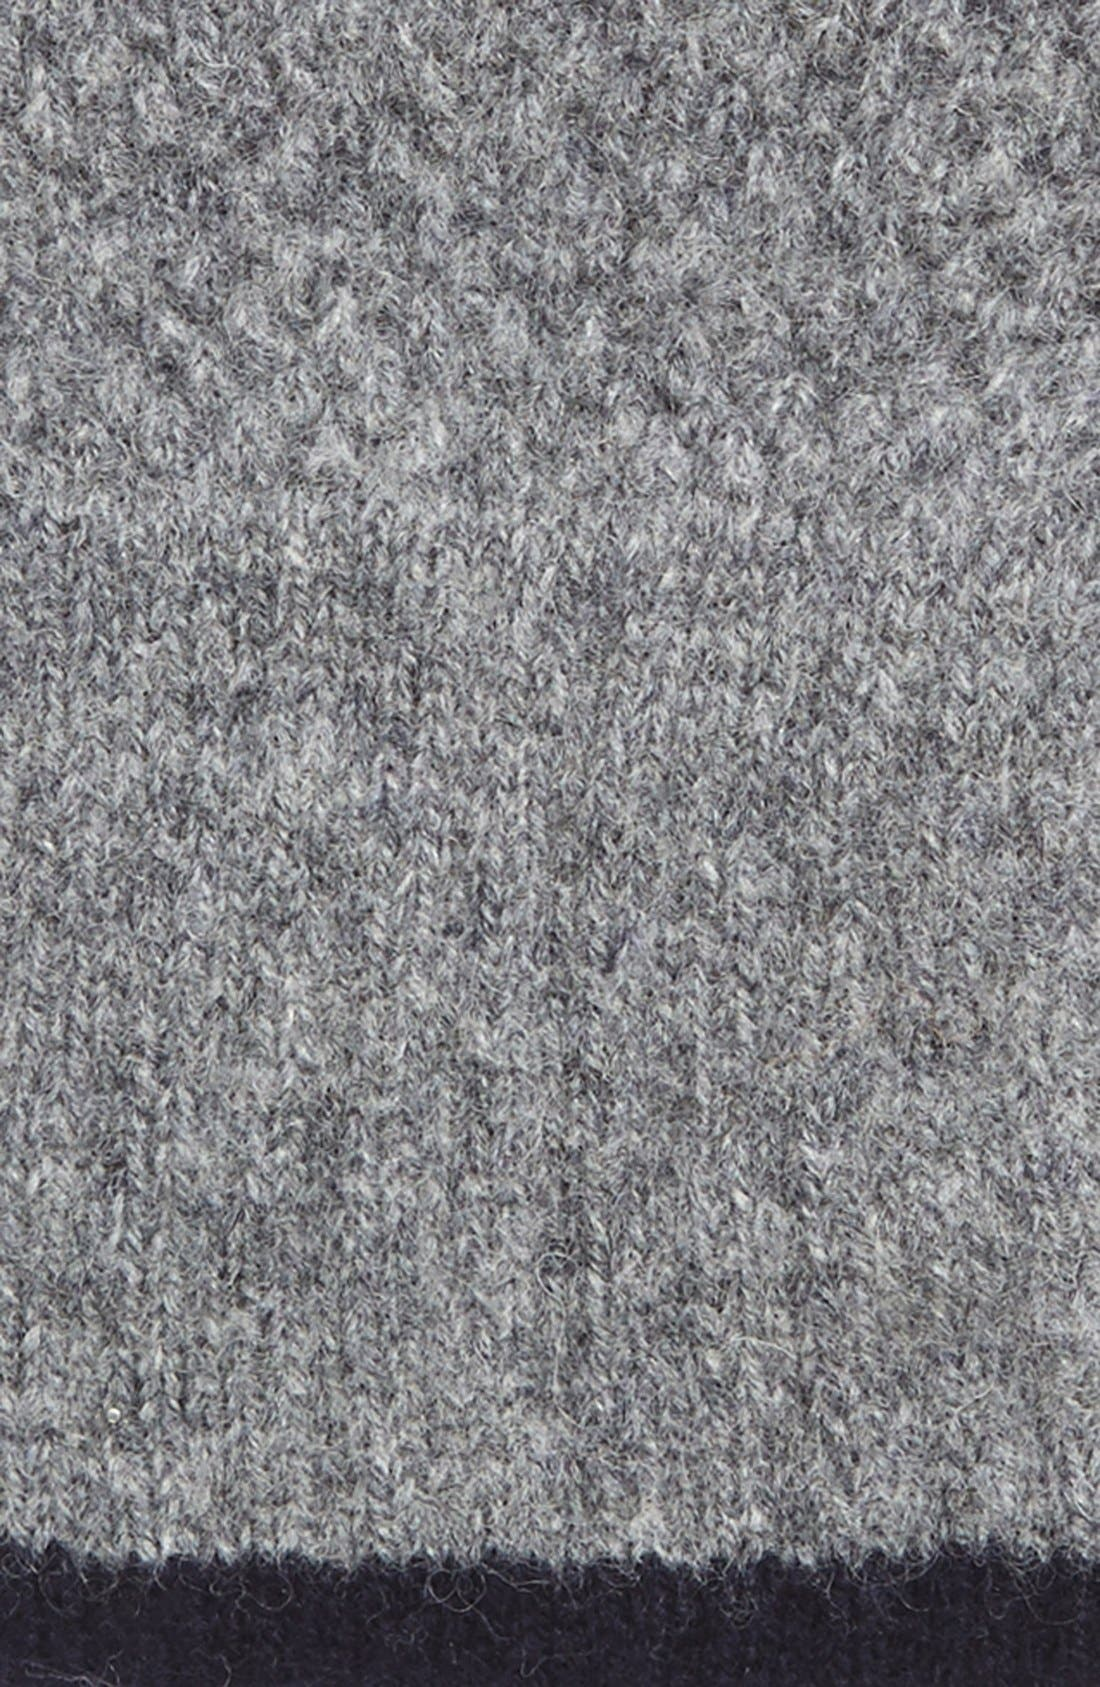 'Canna' Fingerless Wool Gloves,                             Alternate thumbnail 2, color,                             021